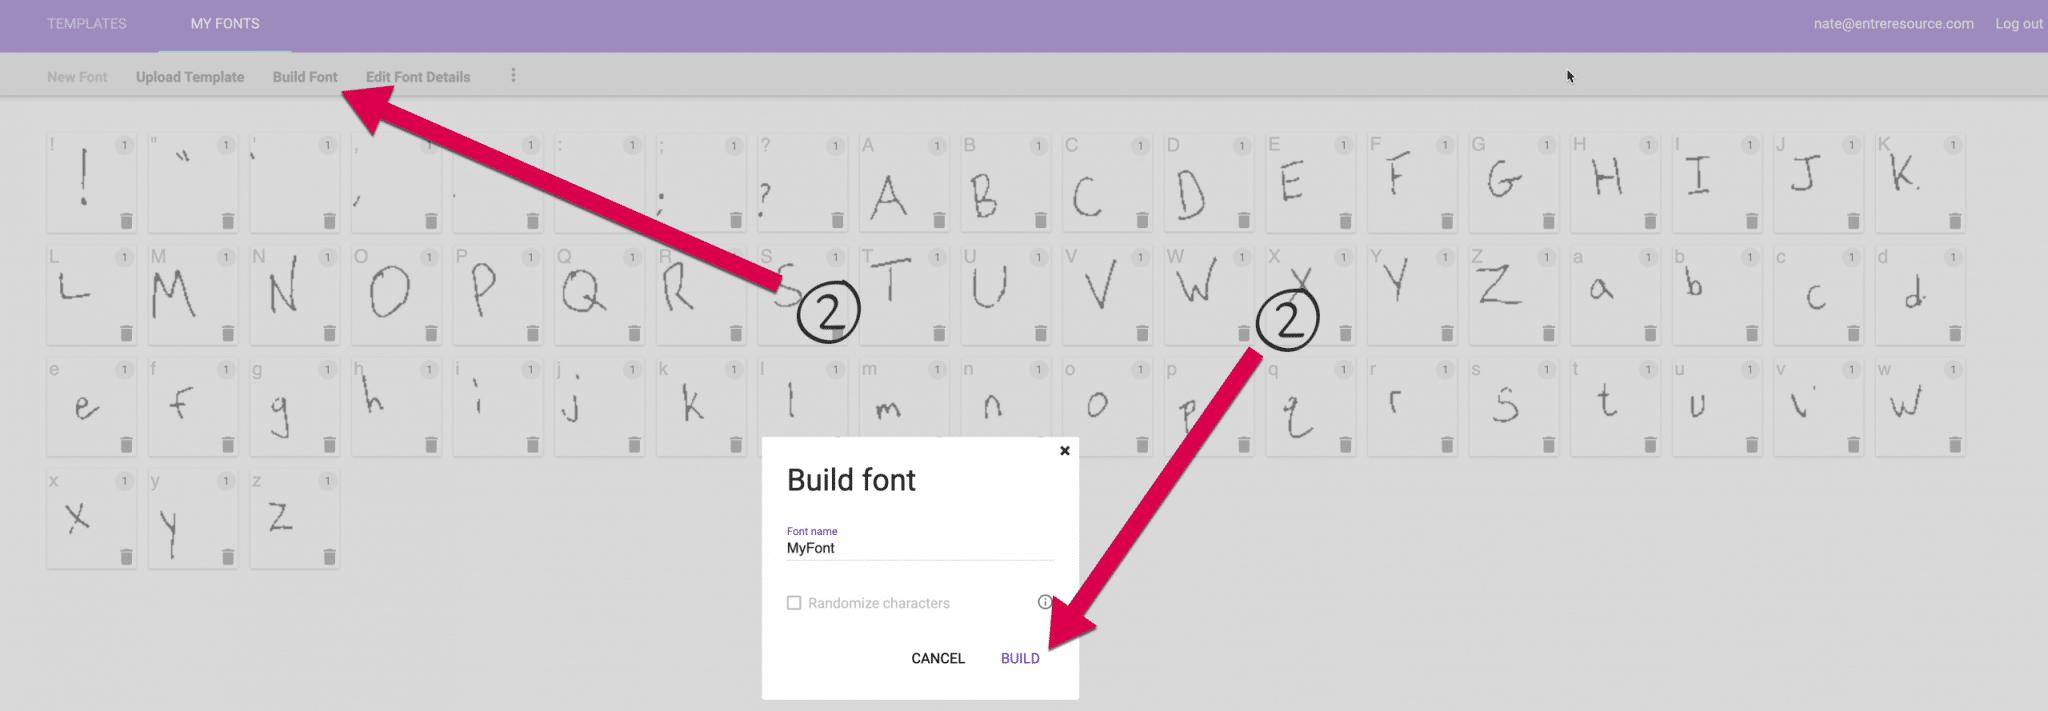 Build Font